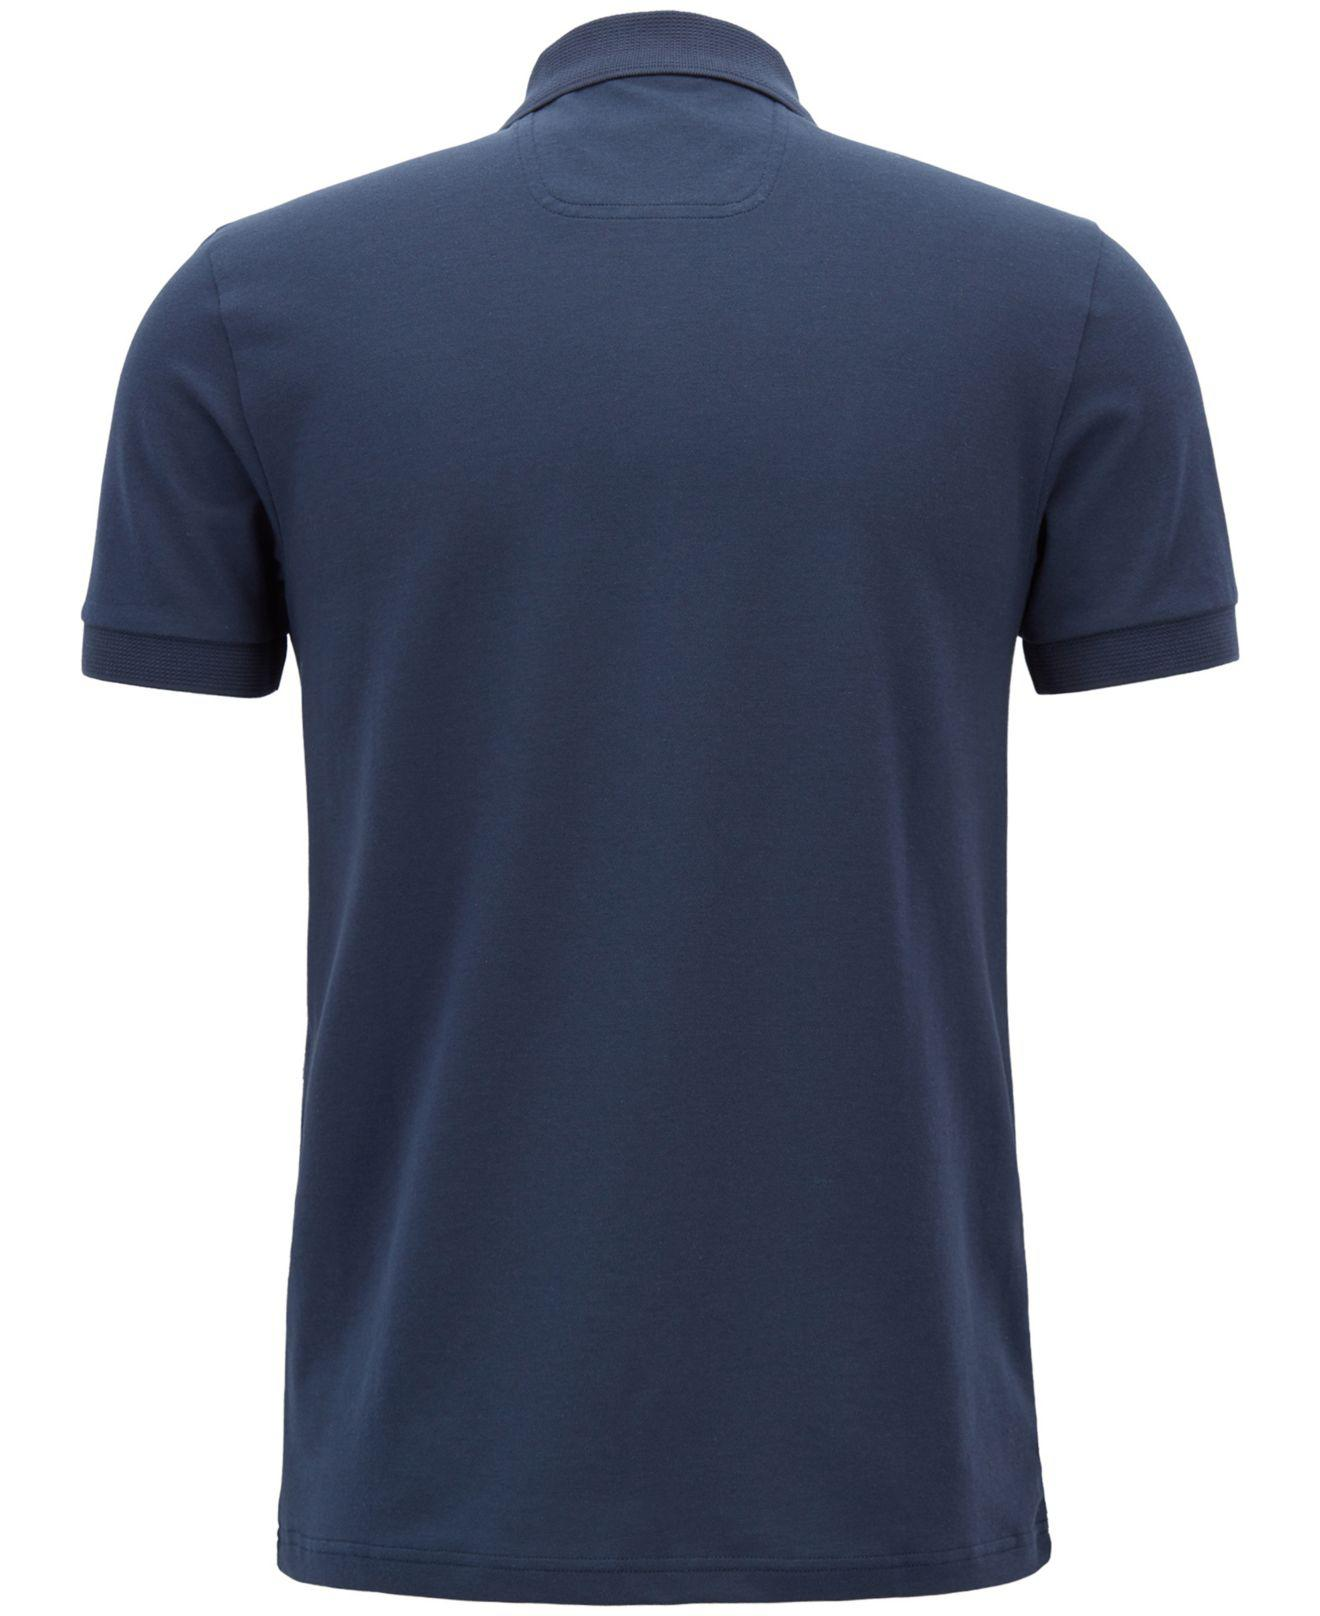 Hugo Boss Style Mens Short Sleeve Striped Custom Fit Polo Shirt Blue Anchor